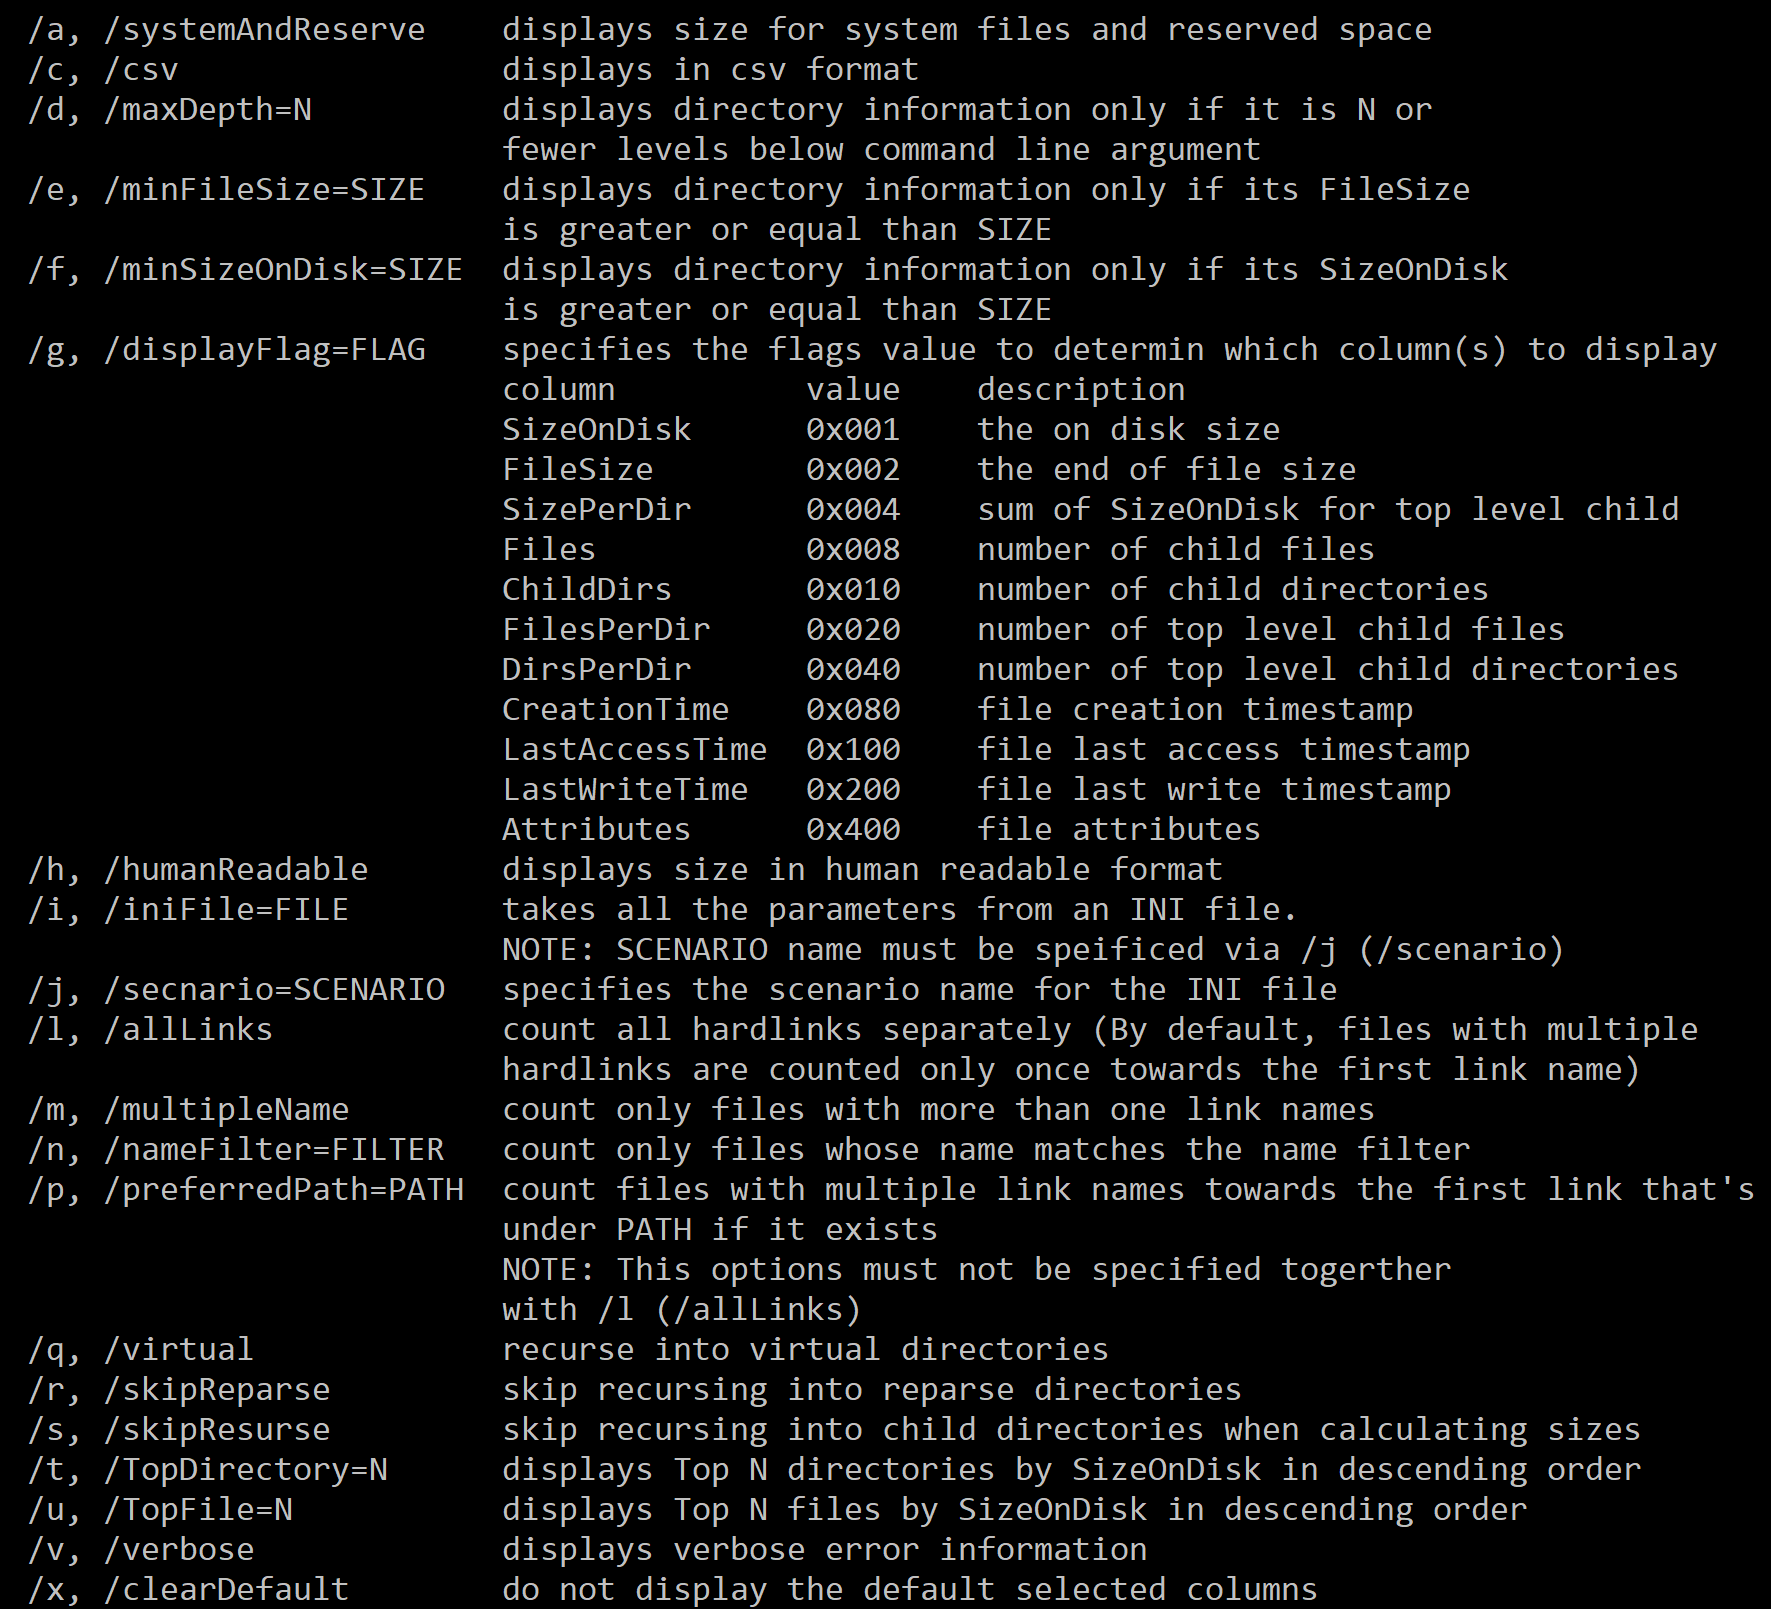 Win 10将新增磁盘查询命令行工具DiskUsage